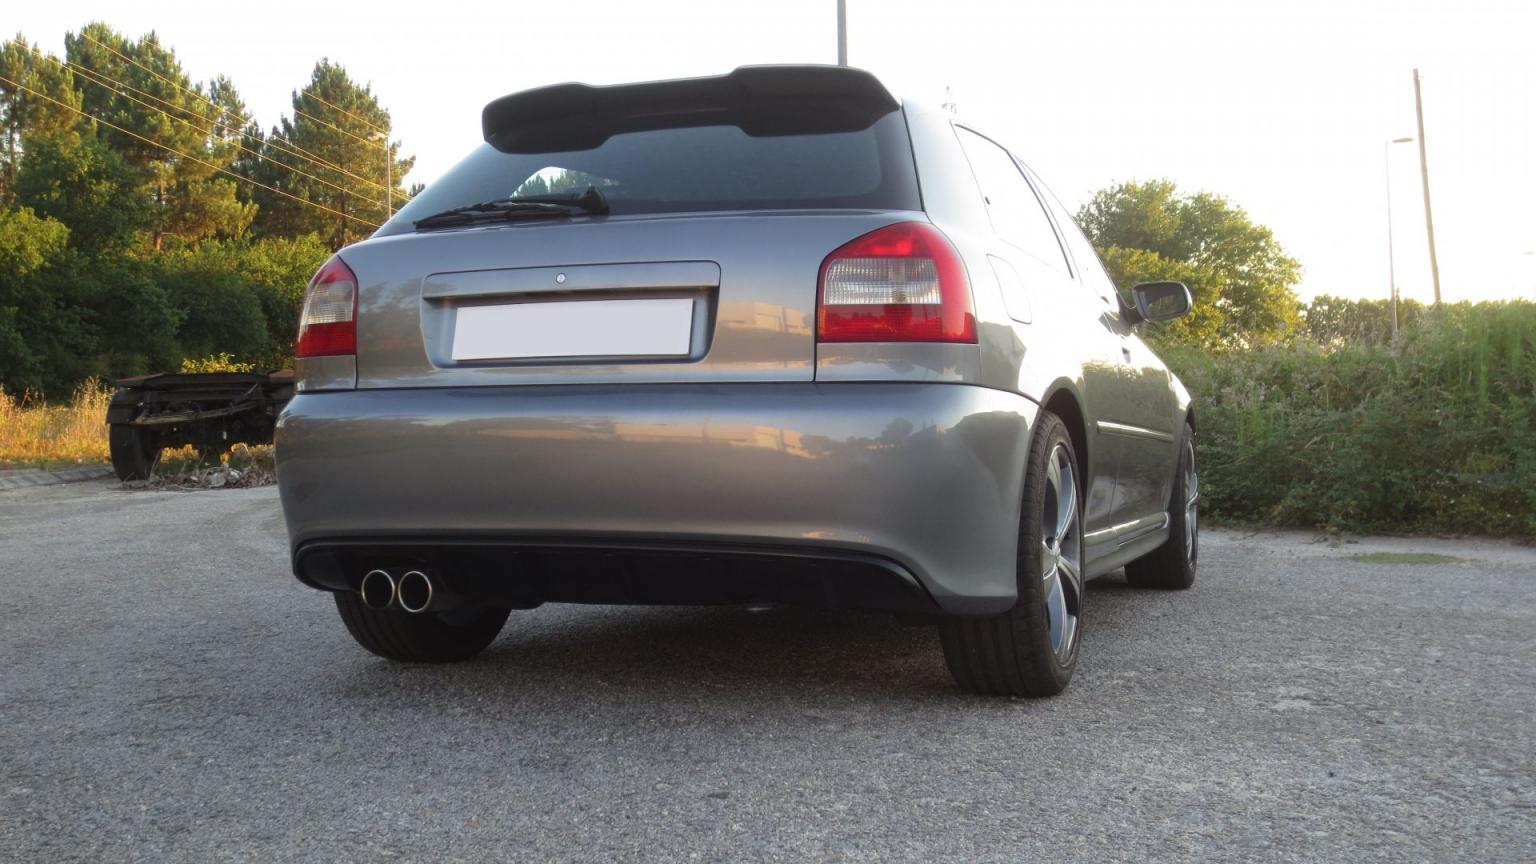 Audi-A3-8L-00-03-Para-choques-Trás-tipo-RS3-1